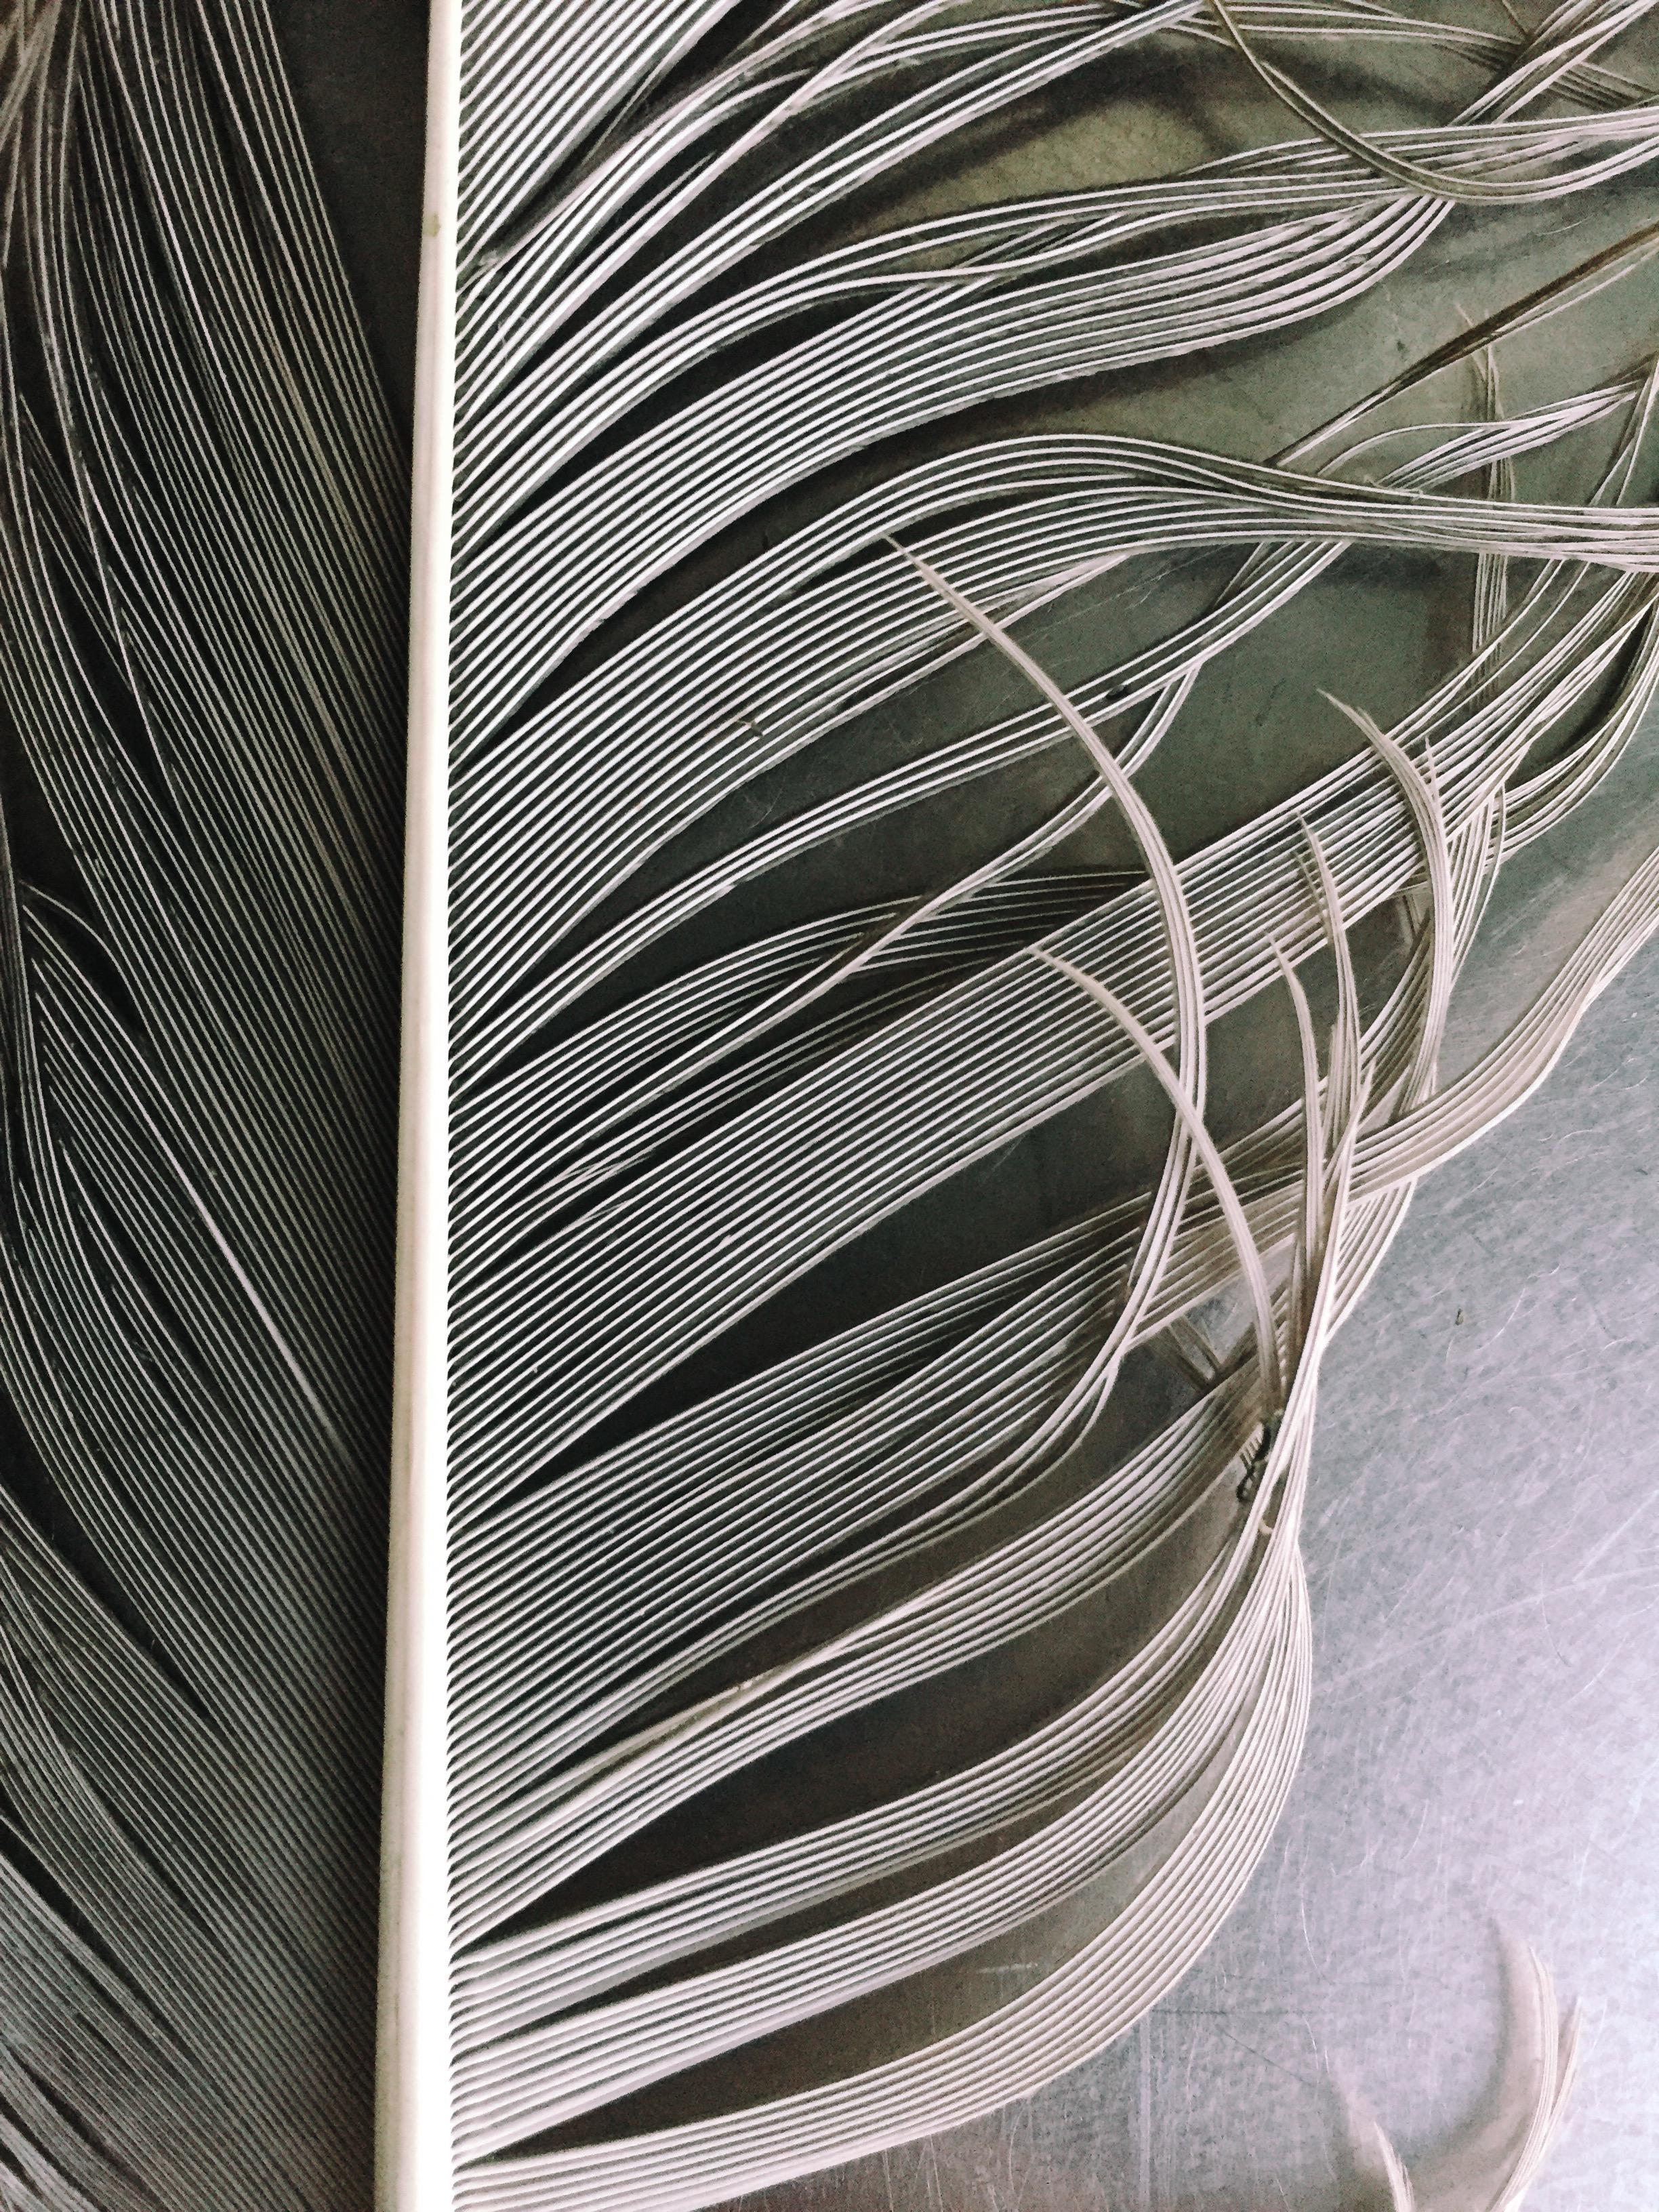 feather.jpeg